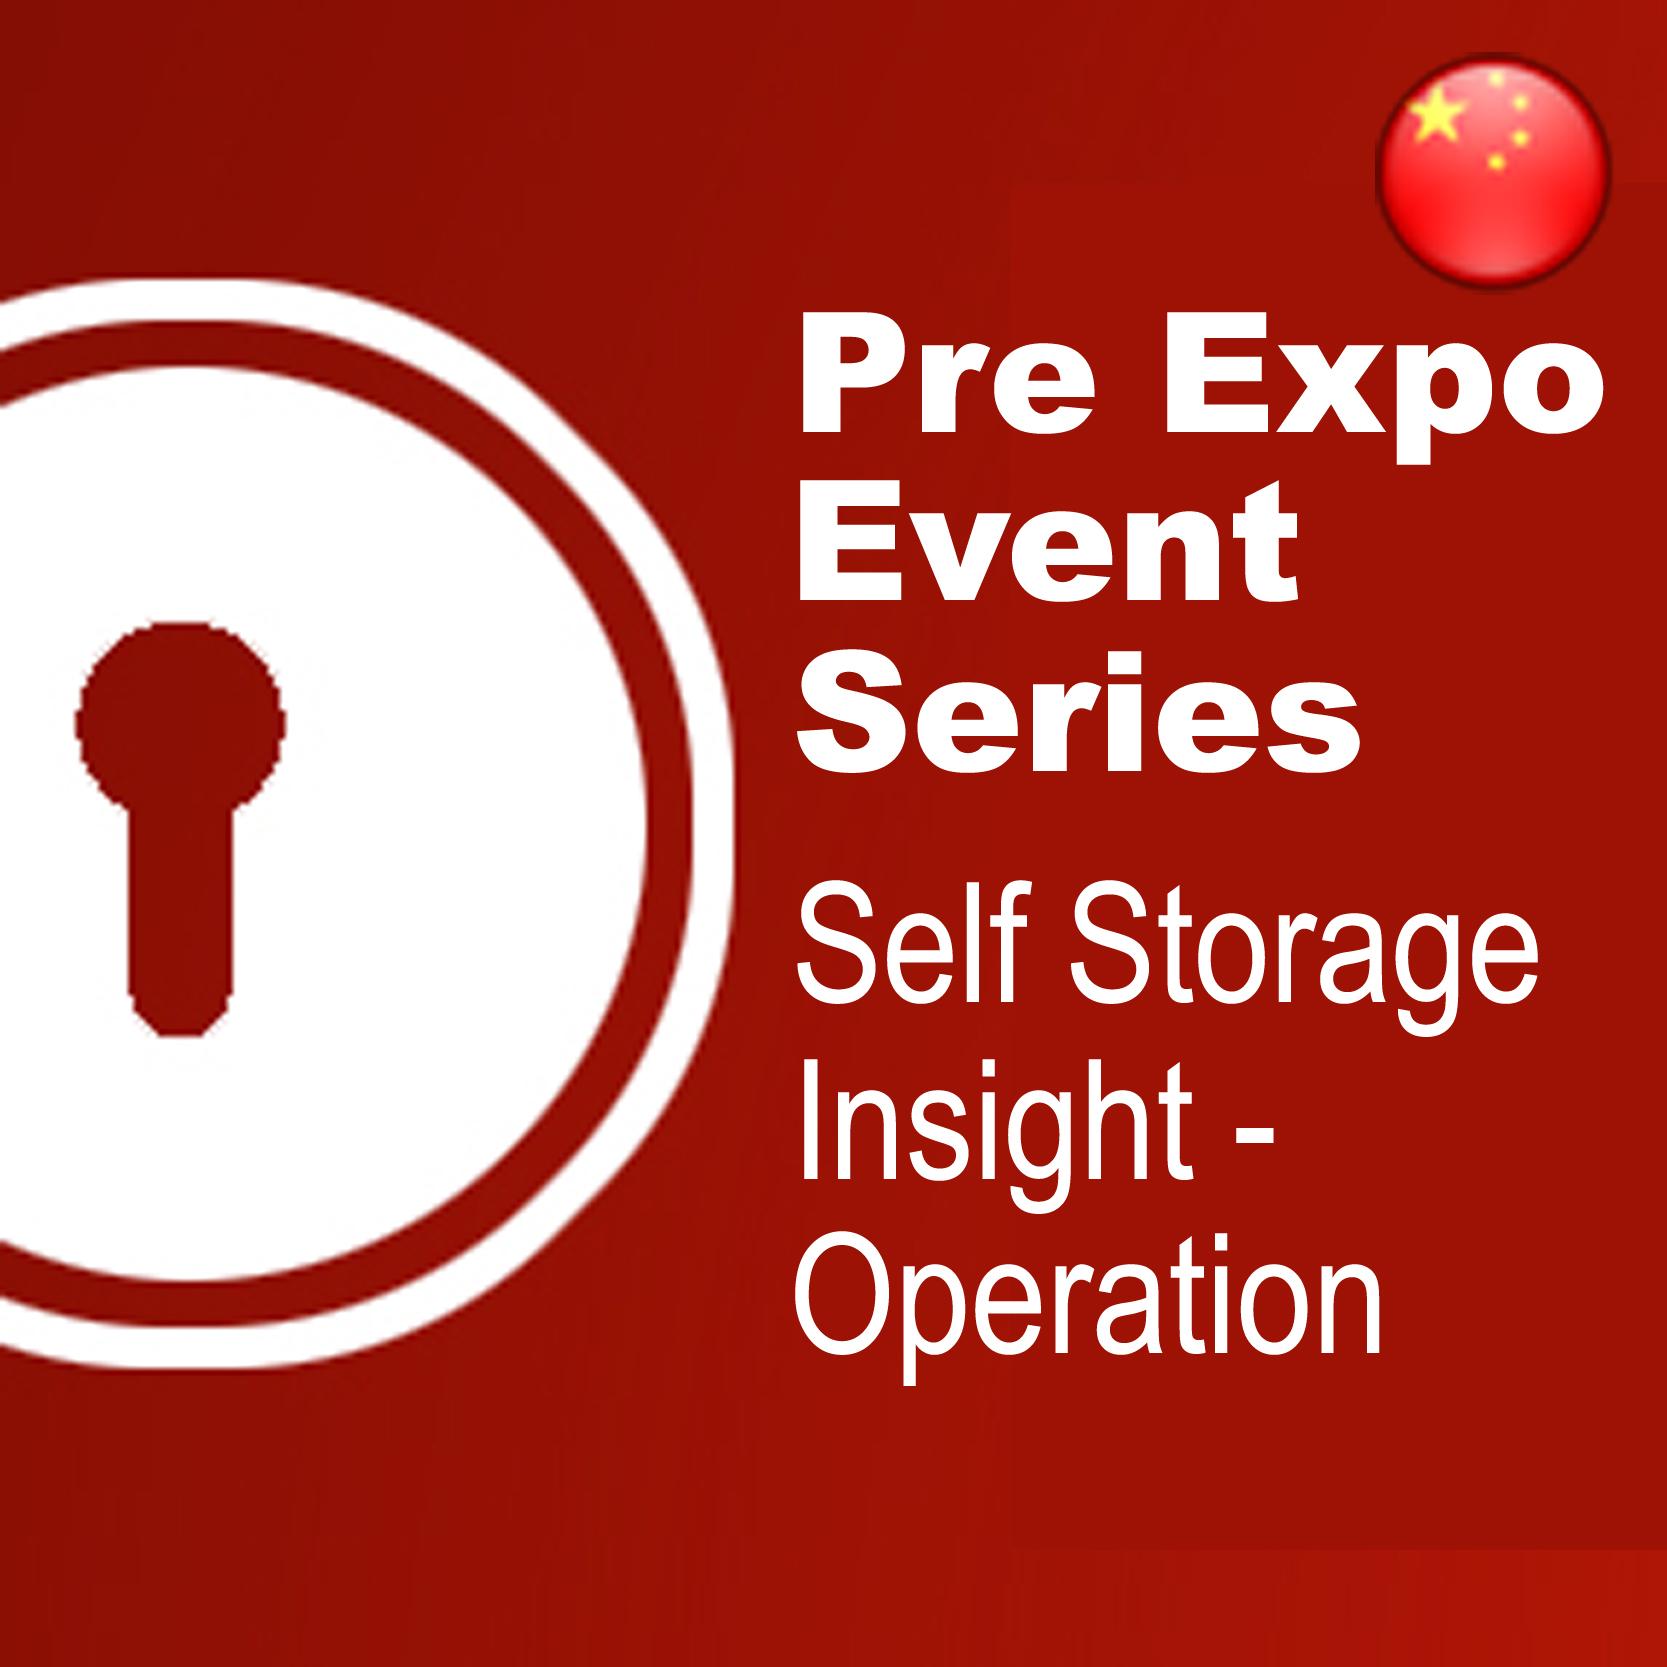 Mar 17 - Pre Expo Series: Self Storage Insight - Operation @ Beijing